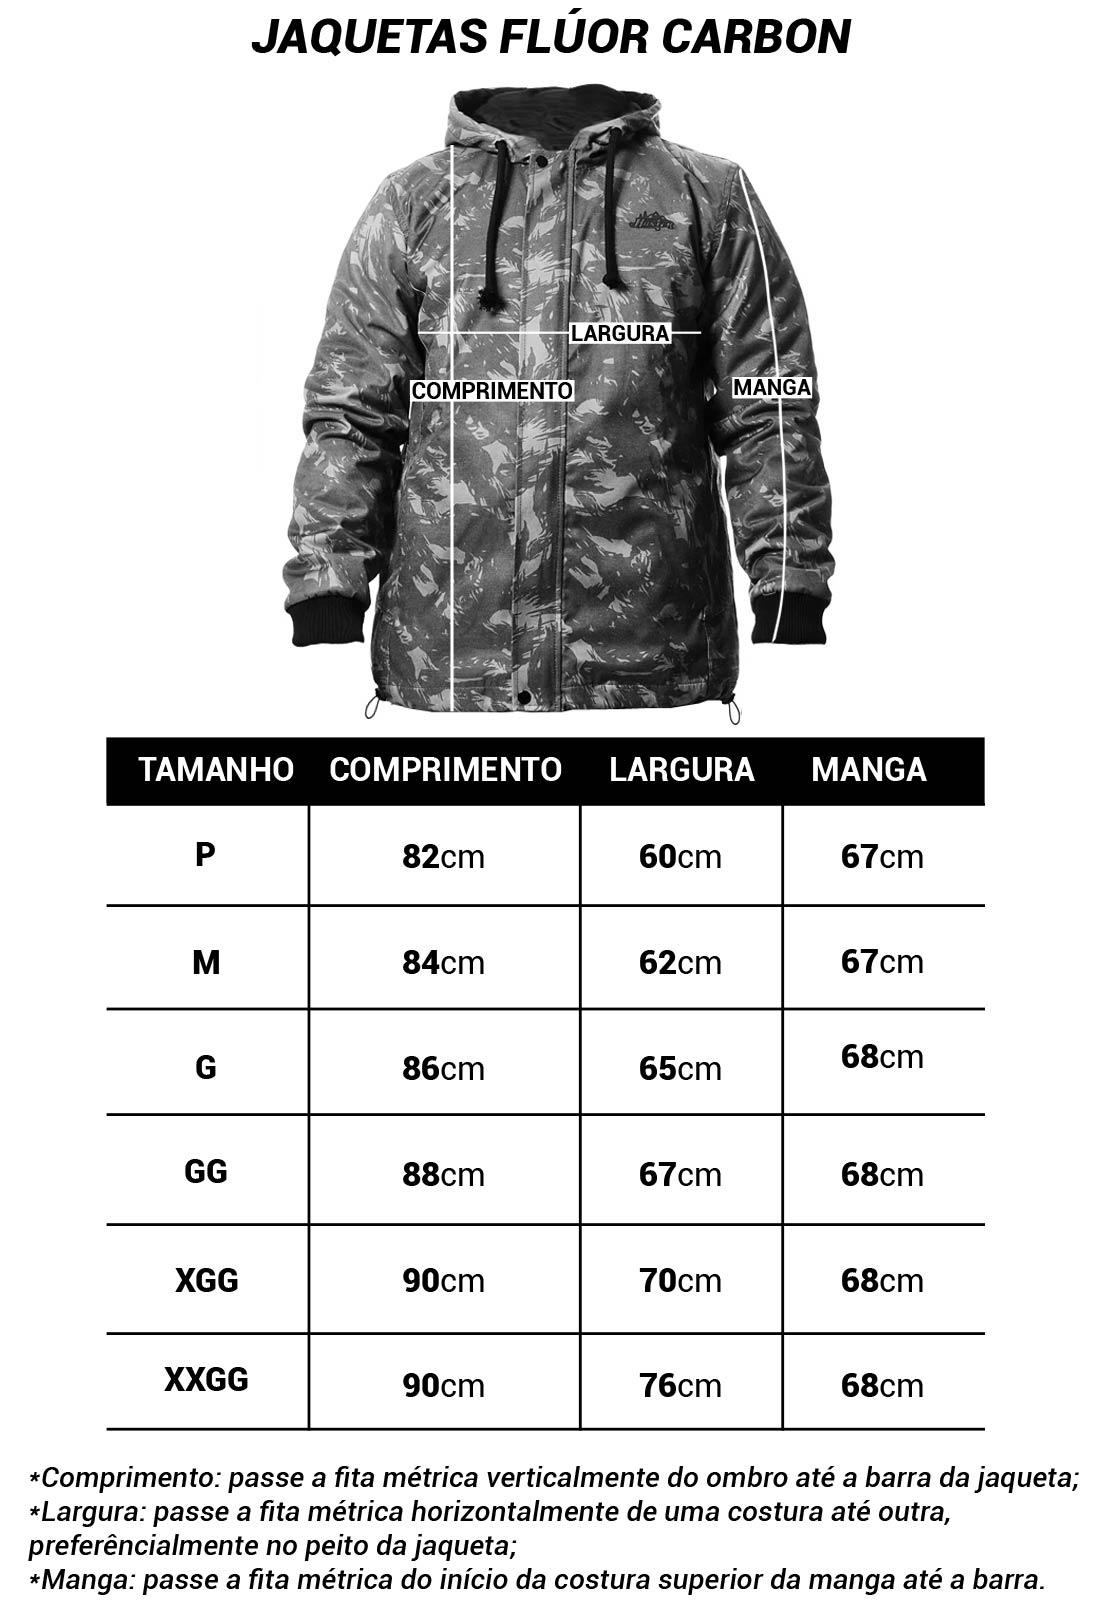 JAQUETA CAMUFLADA MULTICAM FLÚOR CARBON MASCULINA  - Real Hunter